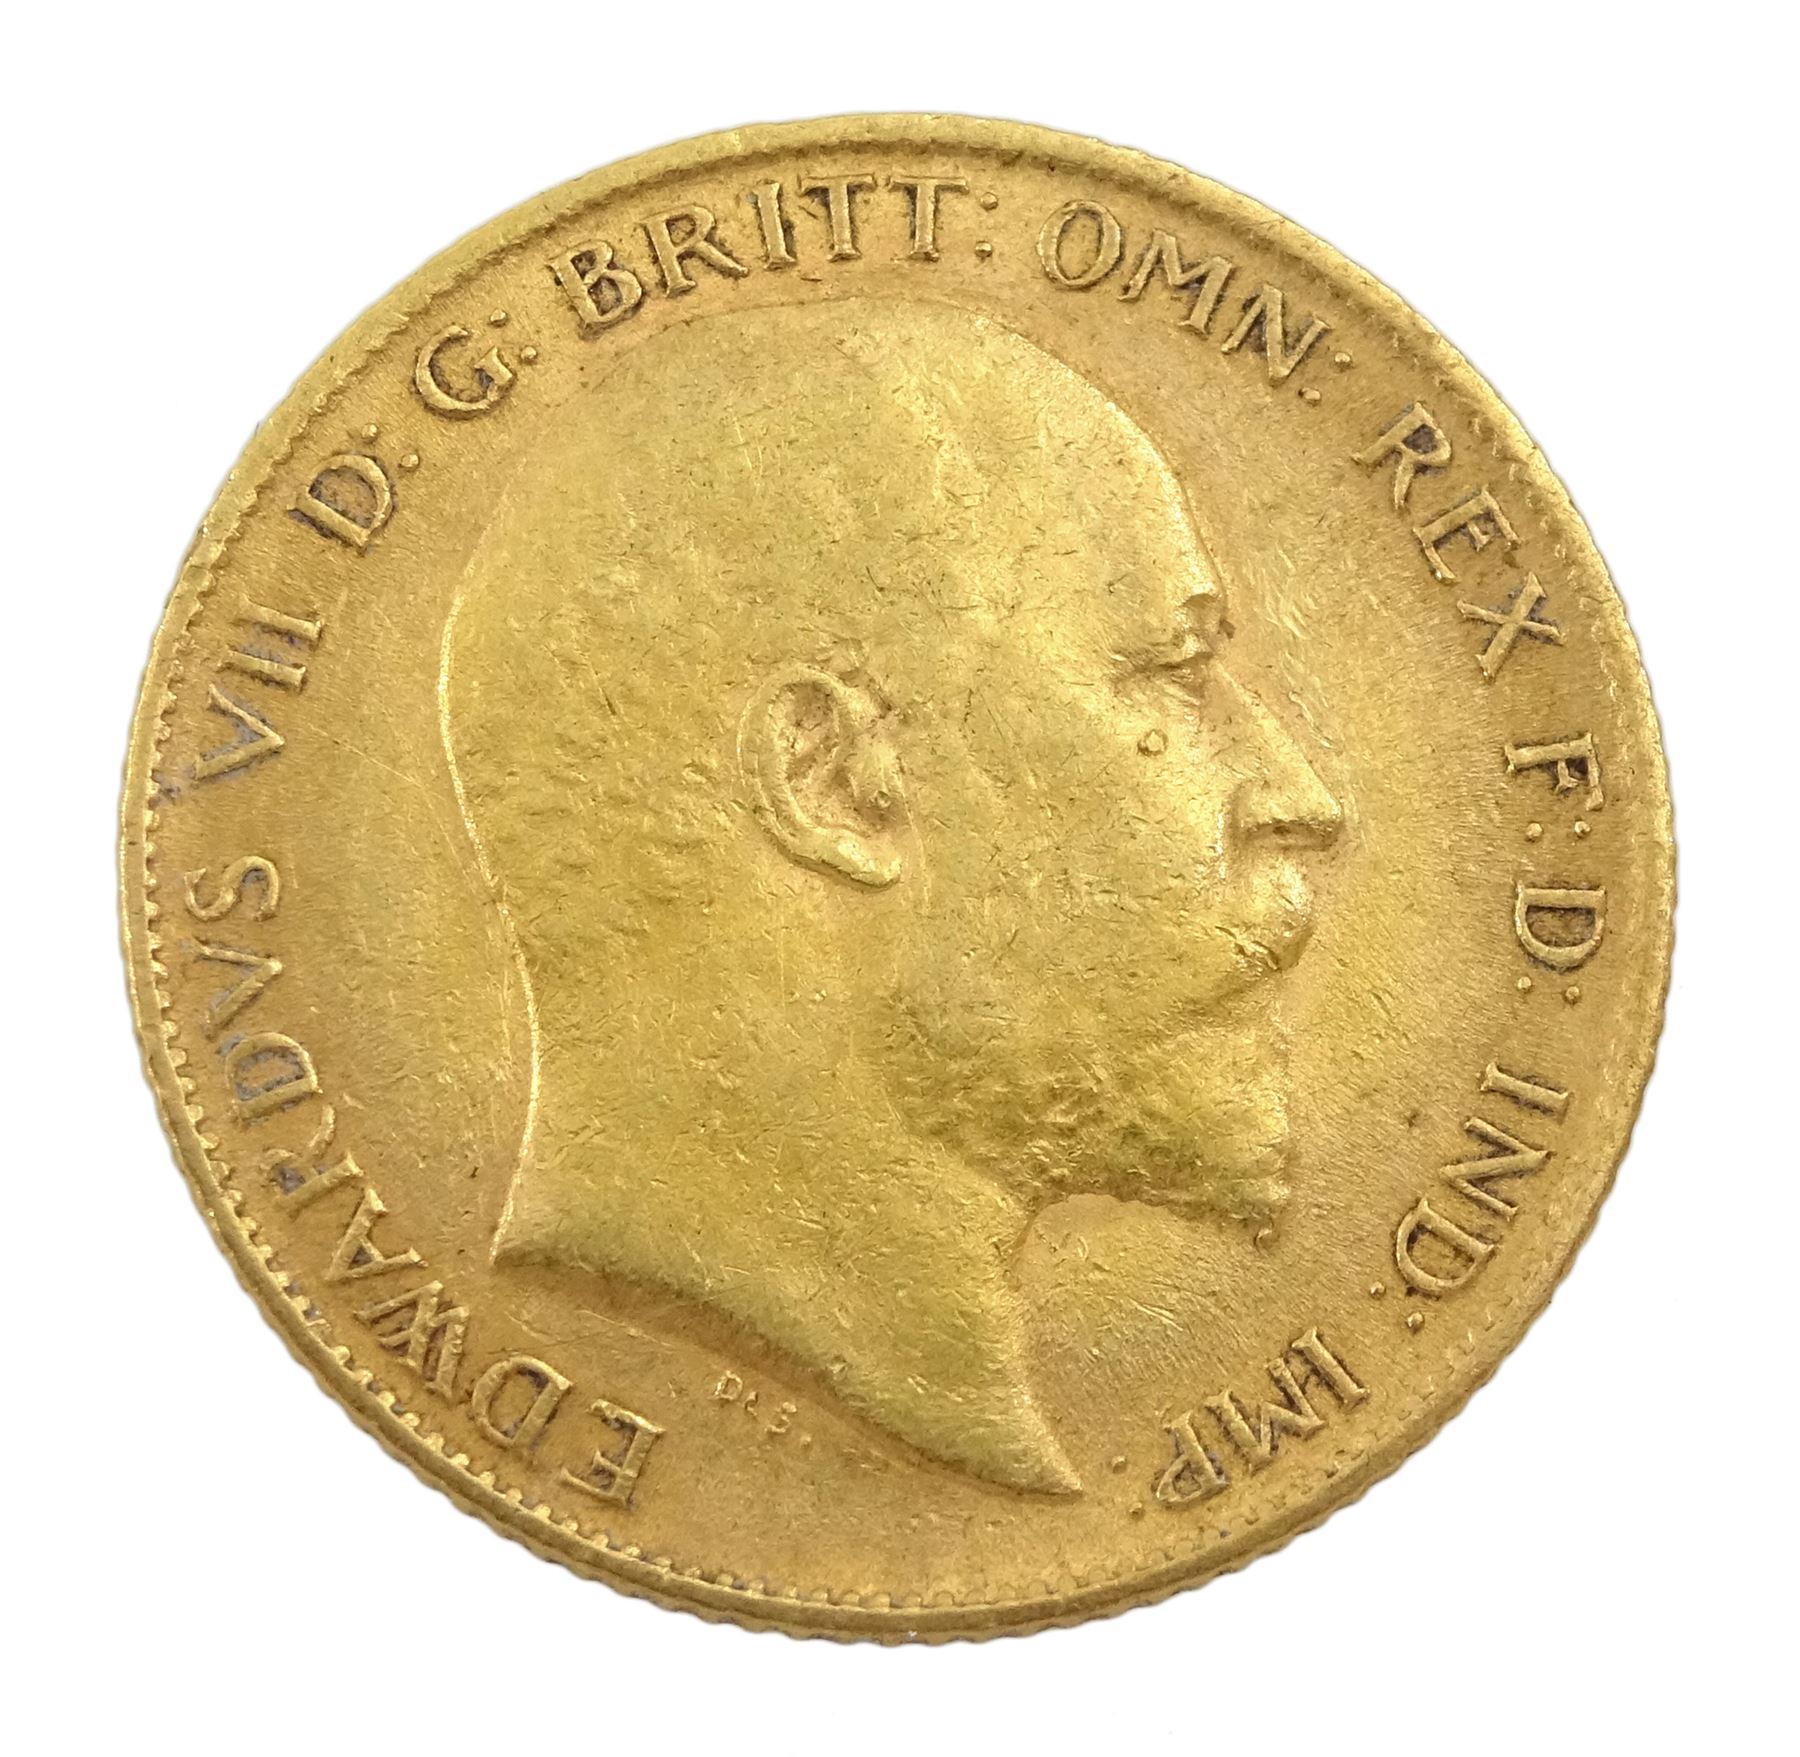 King Edward VII 1910 gold half sovereign coin